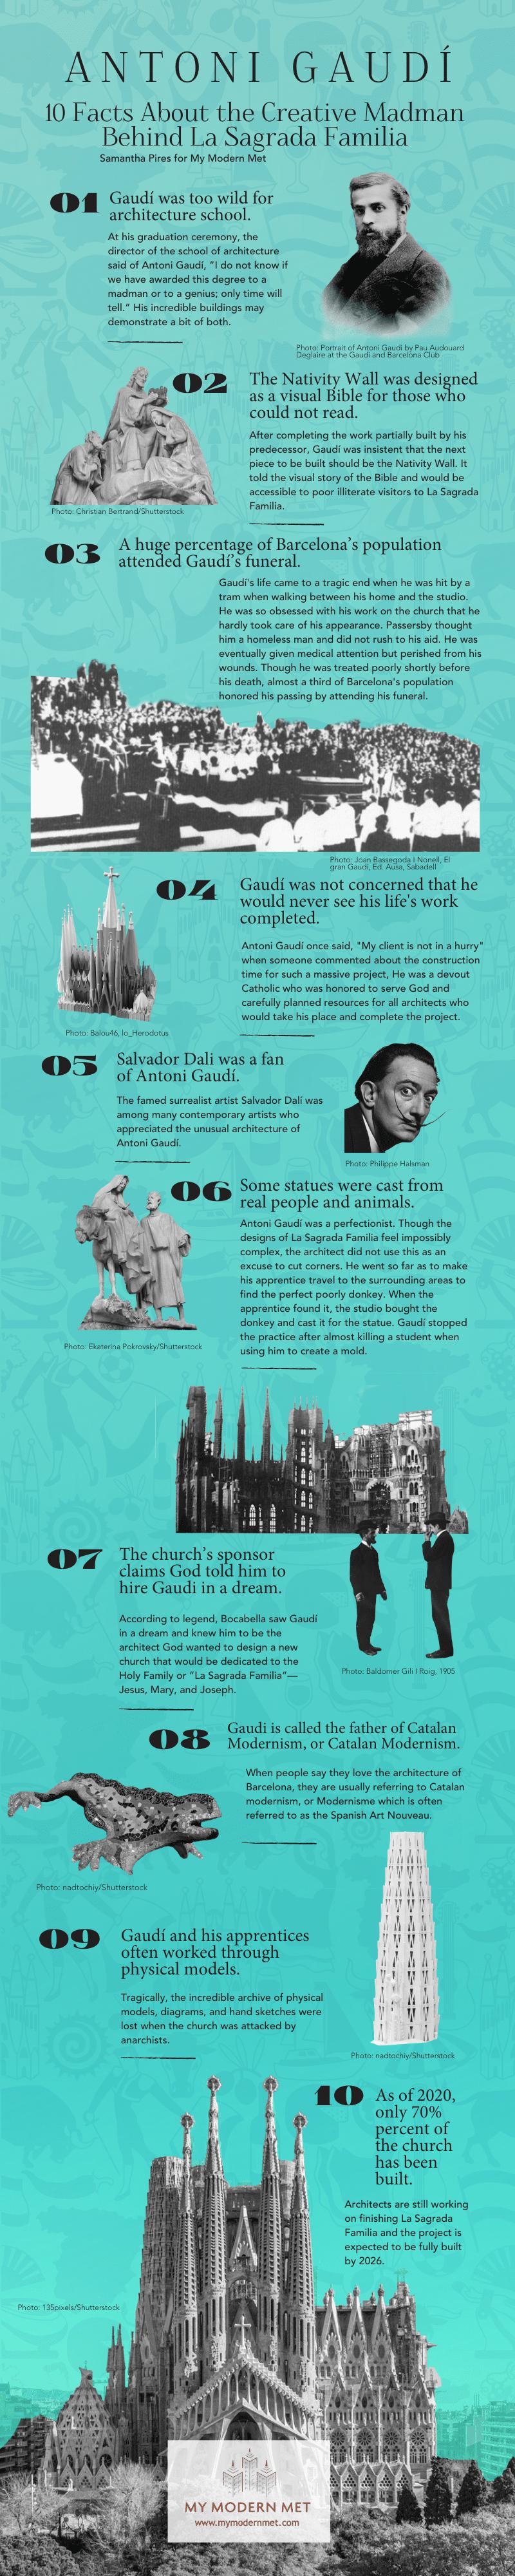 Antoni Gaudi Infographic